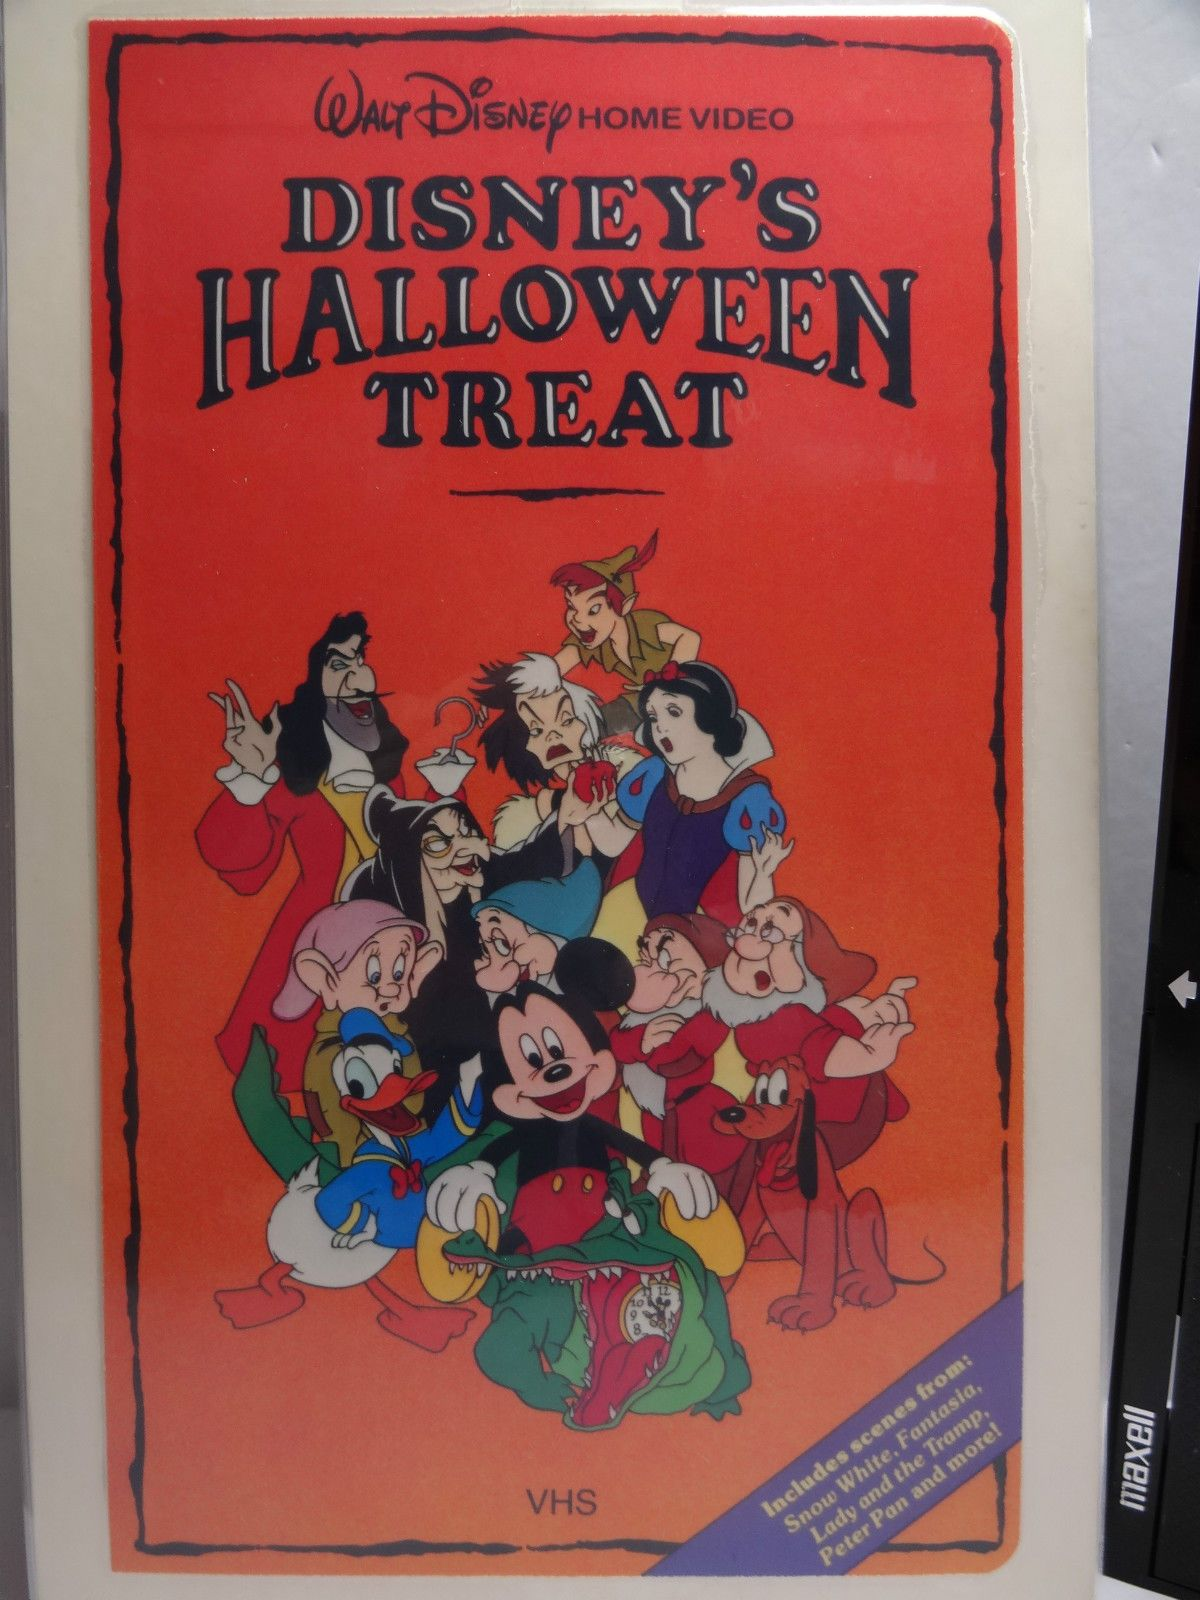 DISNEY'S HALLOWEEN TREAT (VHS) Walt Disney Home Video 47min Cartoon Compilation